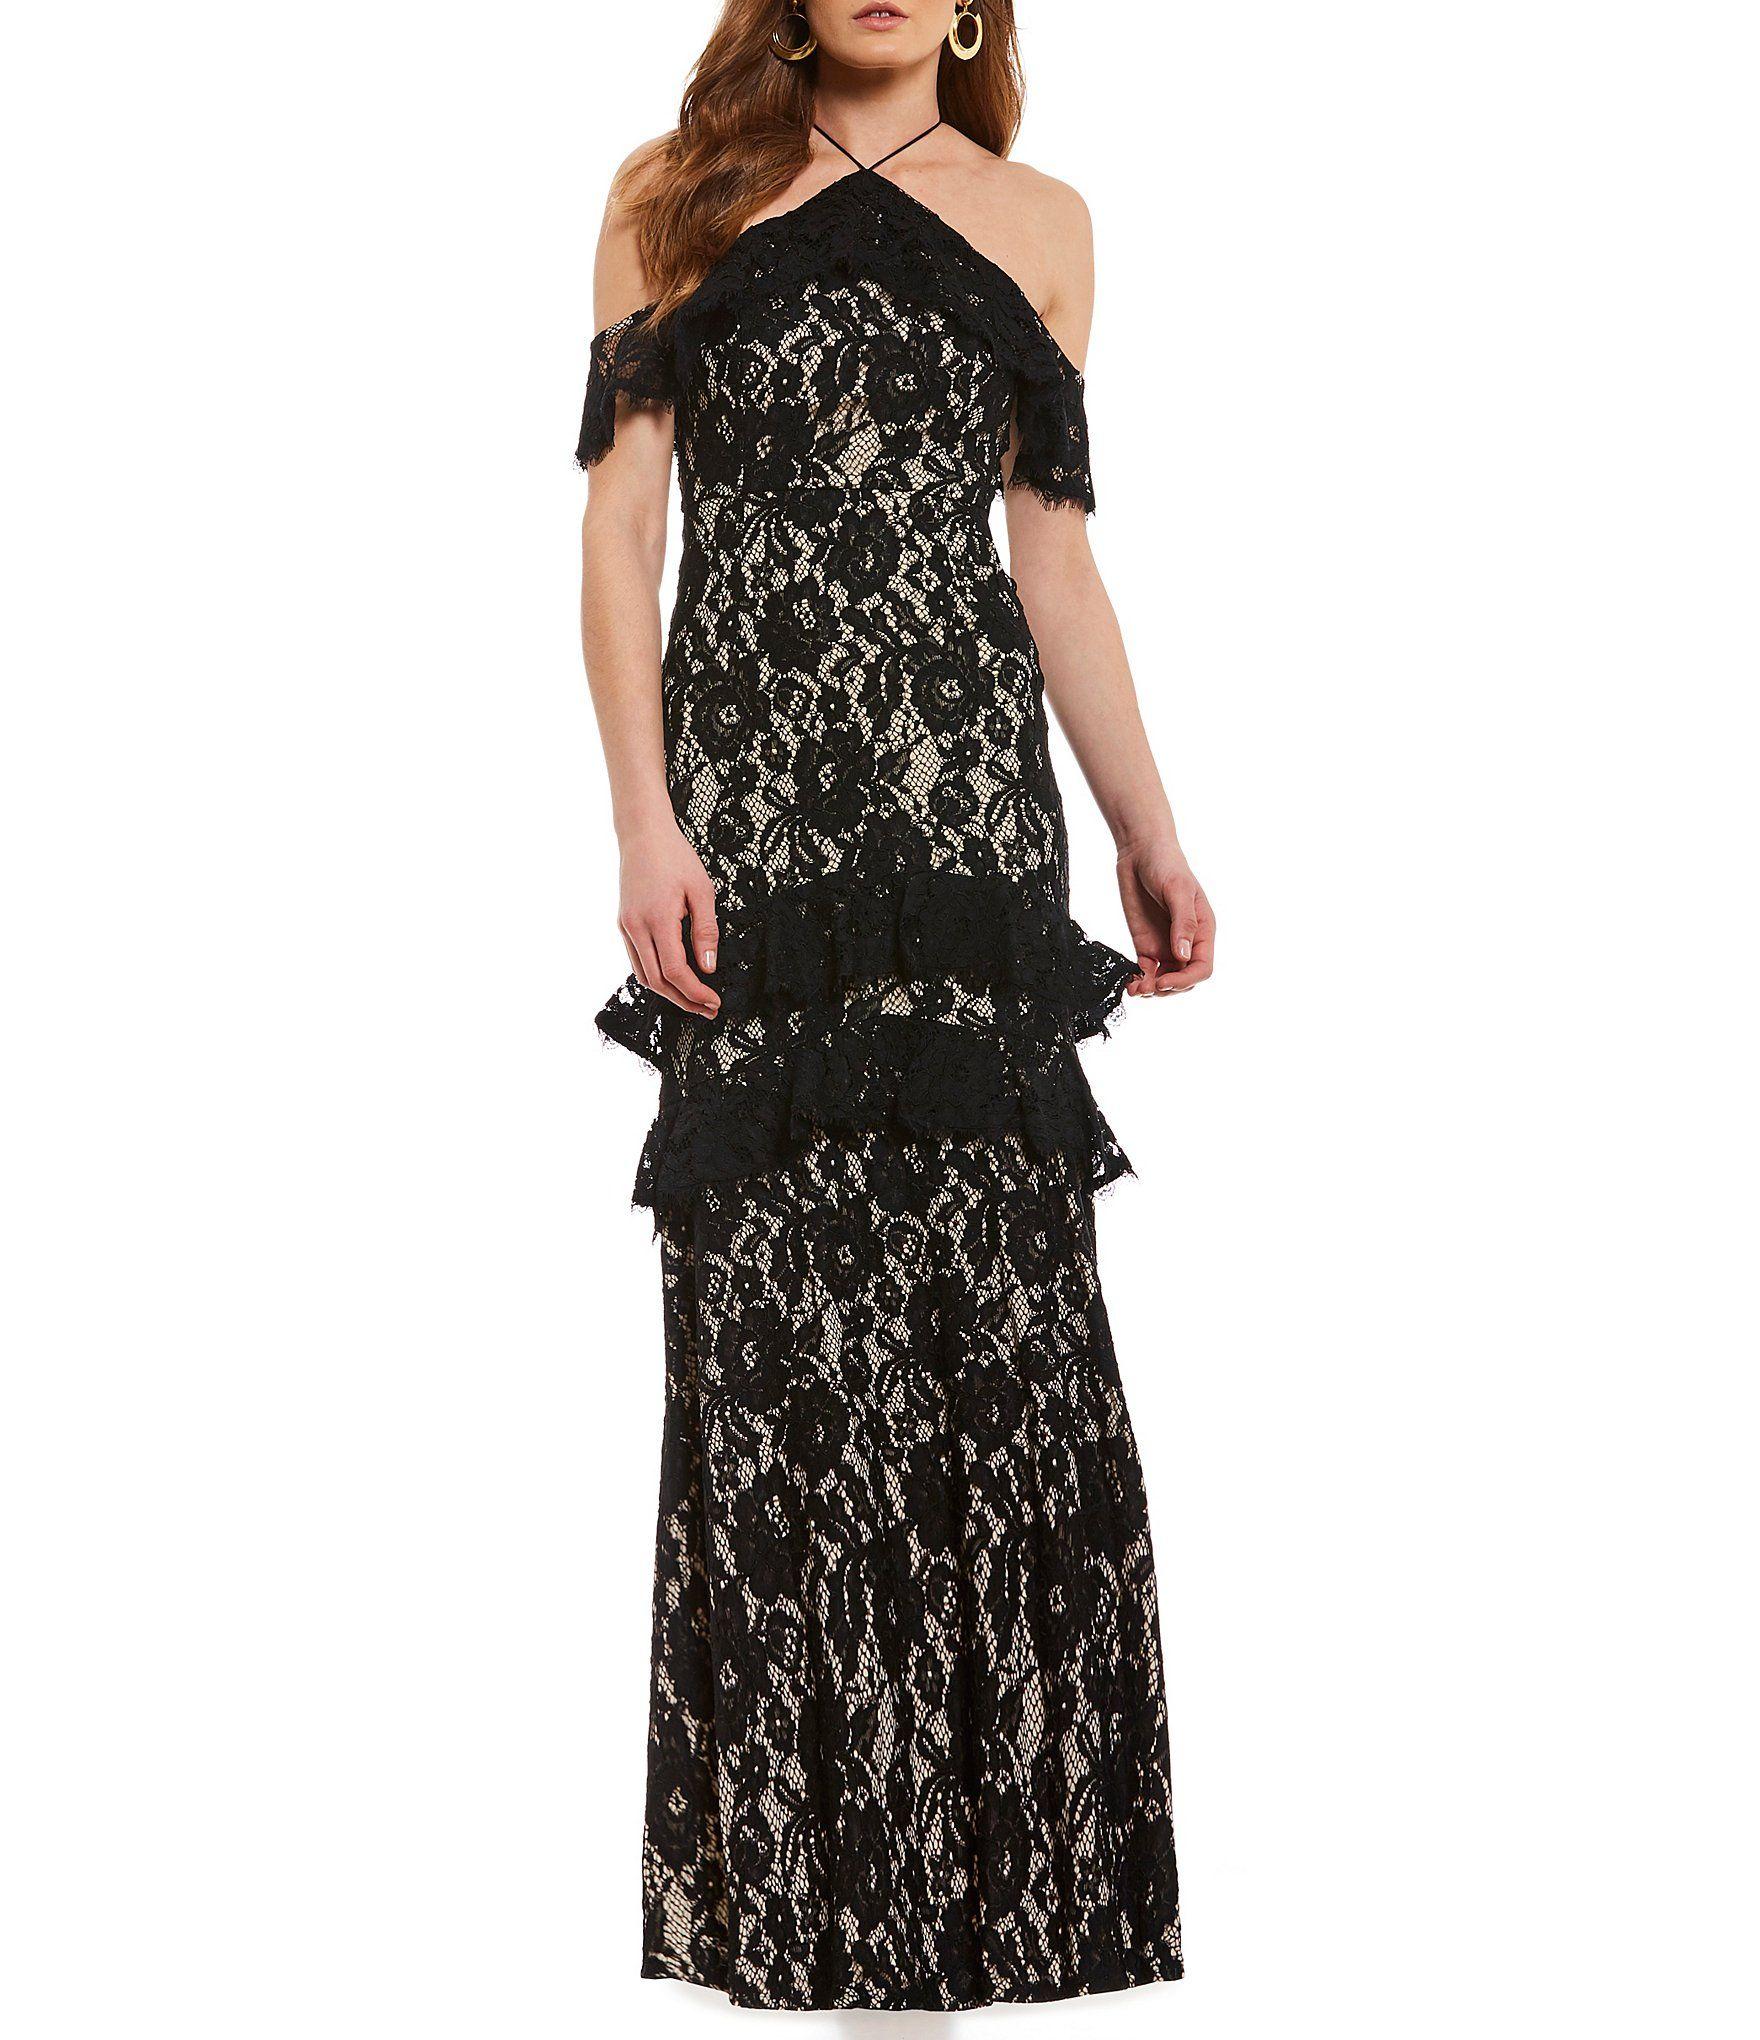 3c6ab9782992 Shop for Aidan Aidan Mattox Lace Halter Cold Shoulder Mermaid Gown at  Dillards.com. Visit Dillards.com to find clothing